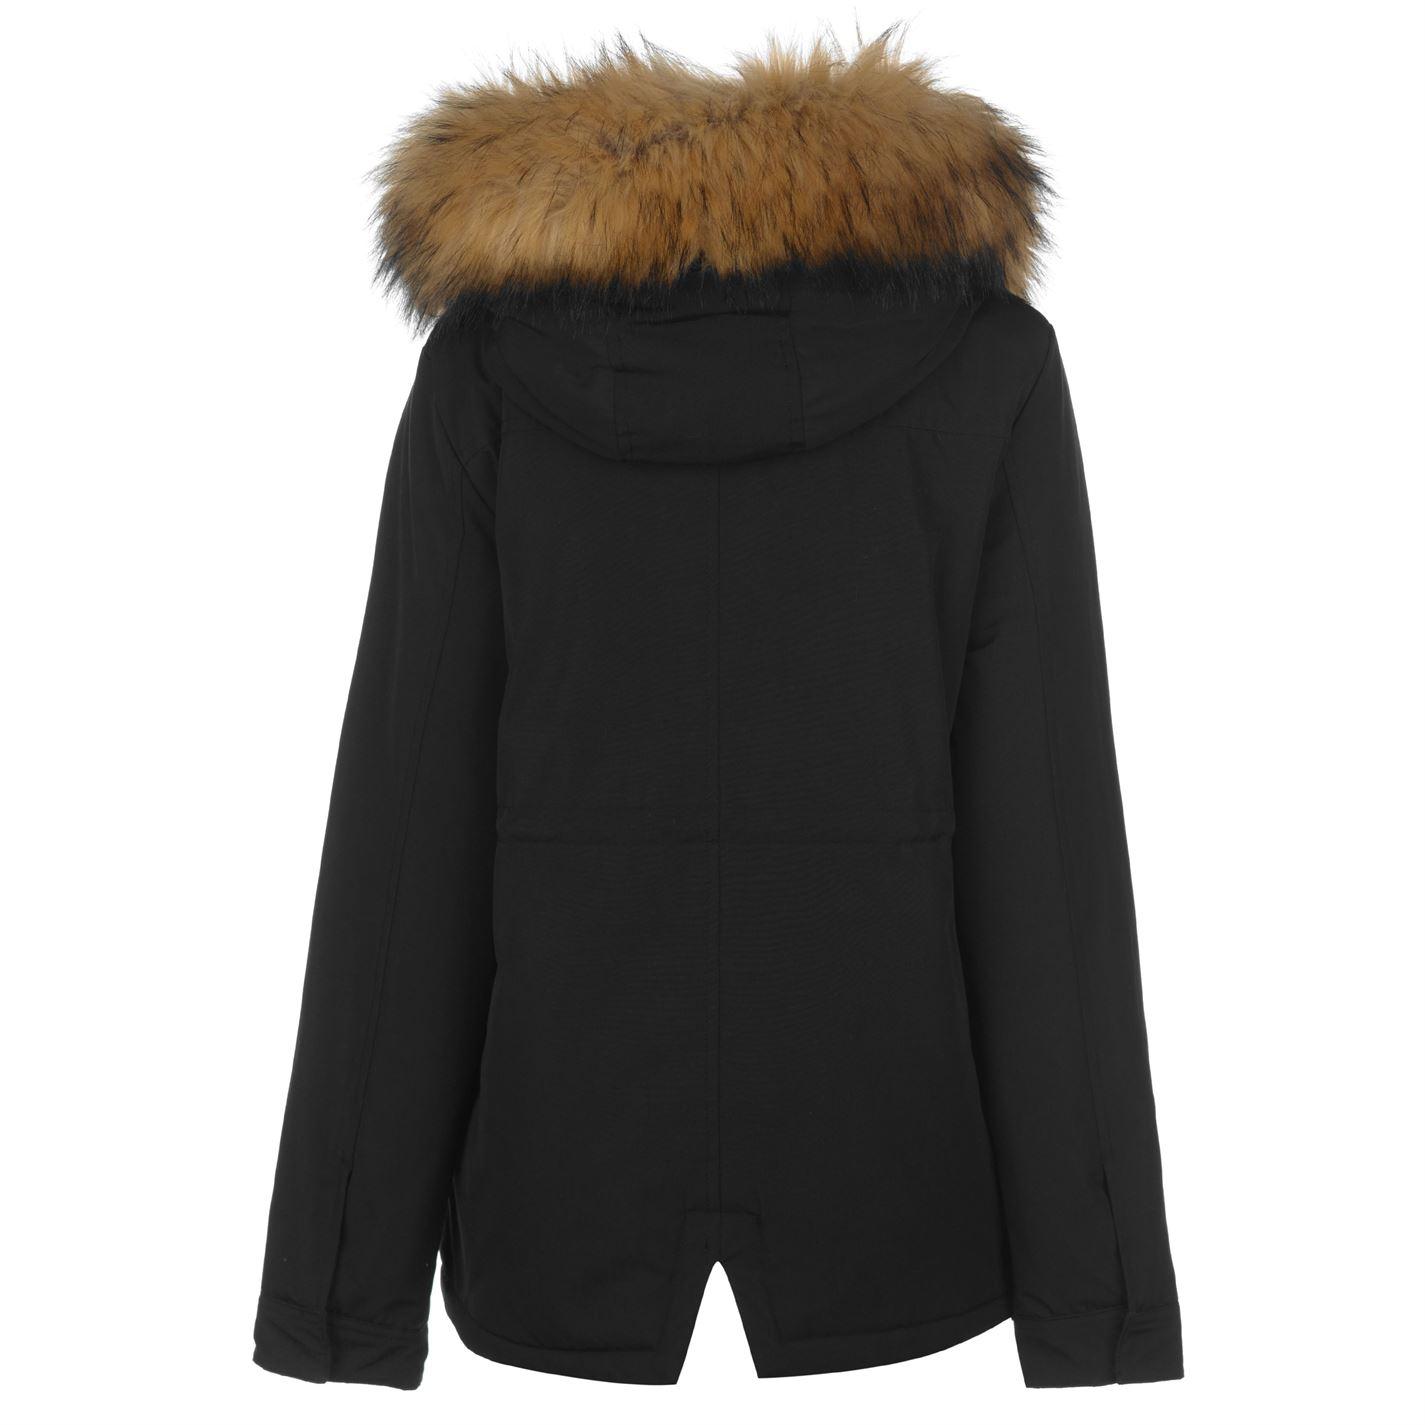 Kangol Pintuck Parka Jacket Ladies Coat Top Full Length Sleeve Hooded Zip Zipped